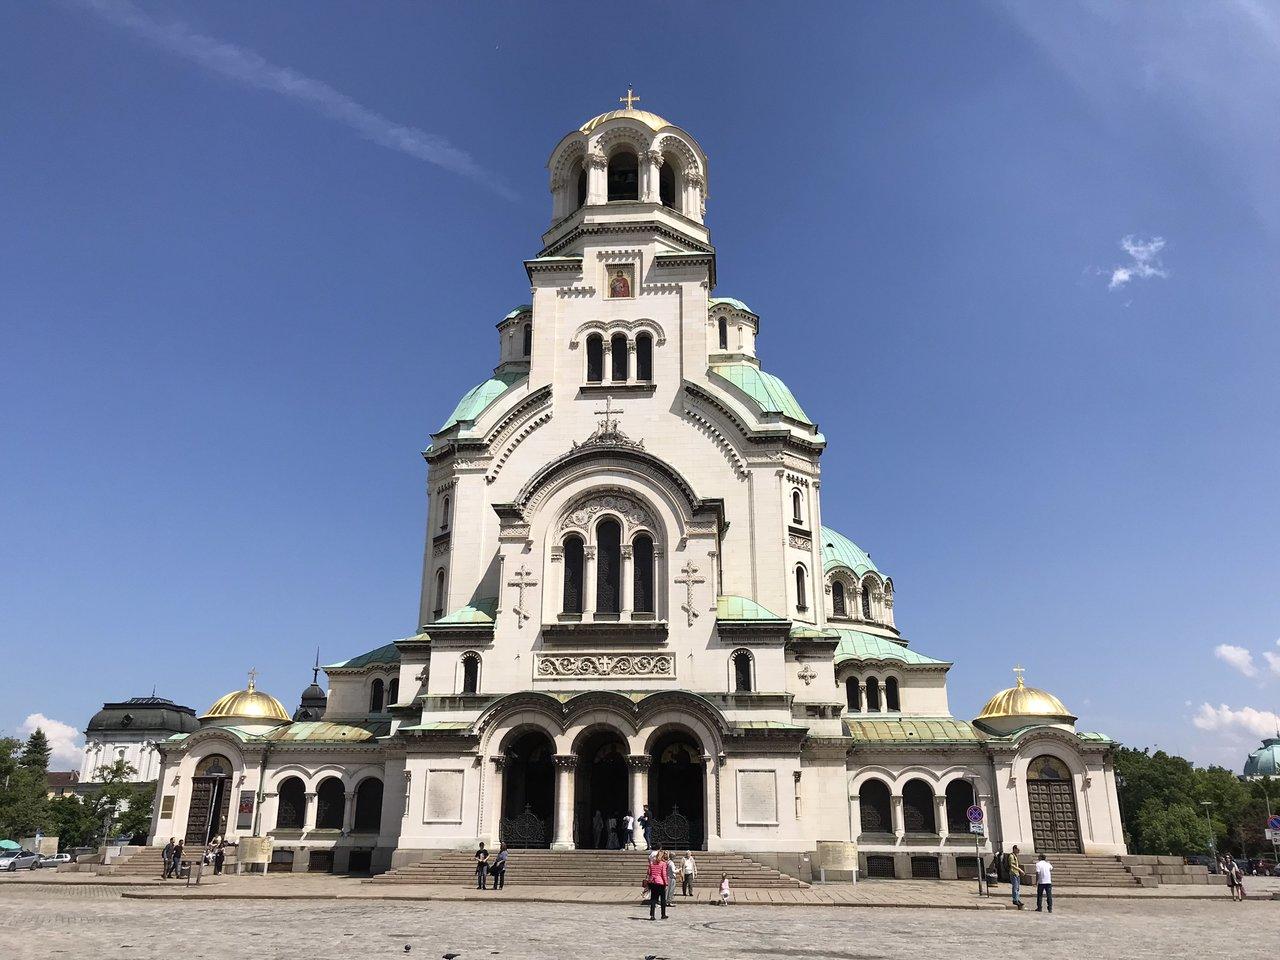 Alexander Nevski Cathedral. | Photo taken by Alison C